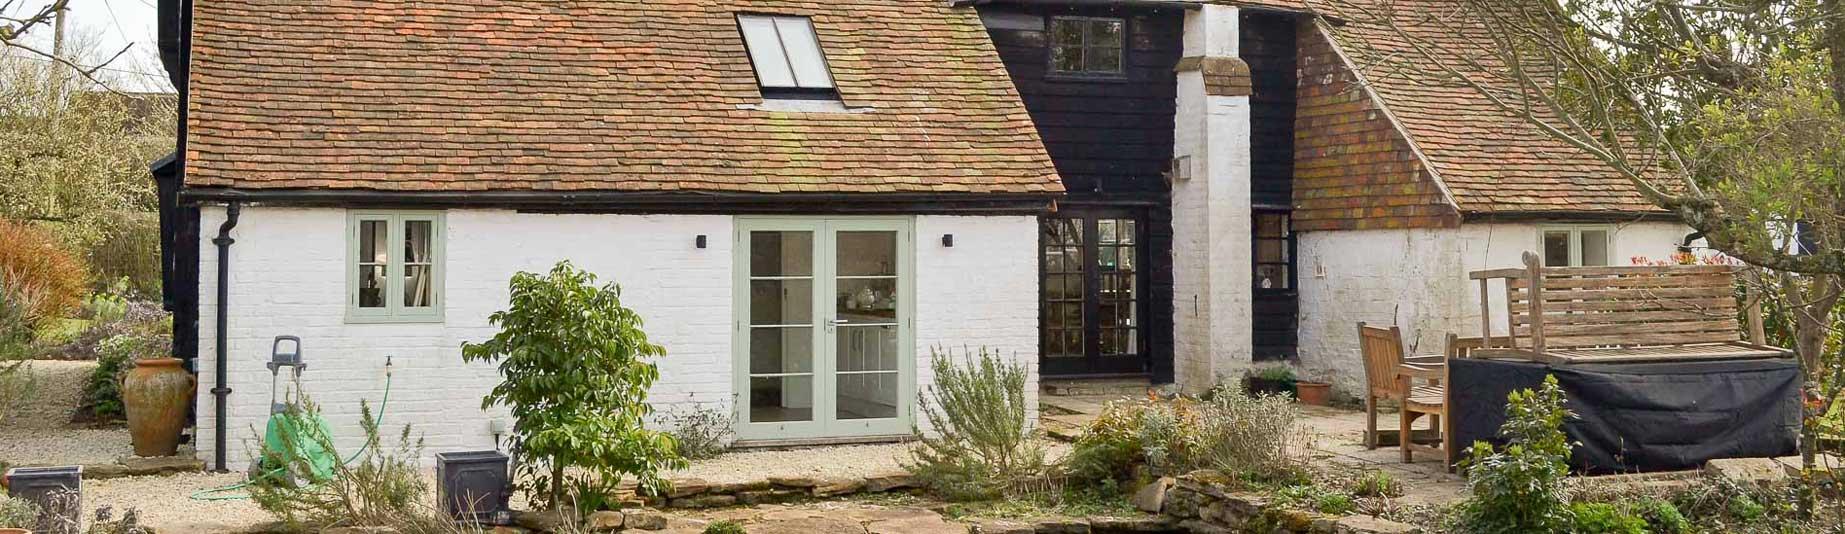 Tenterden Roofing - White Brick House